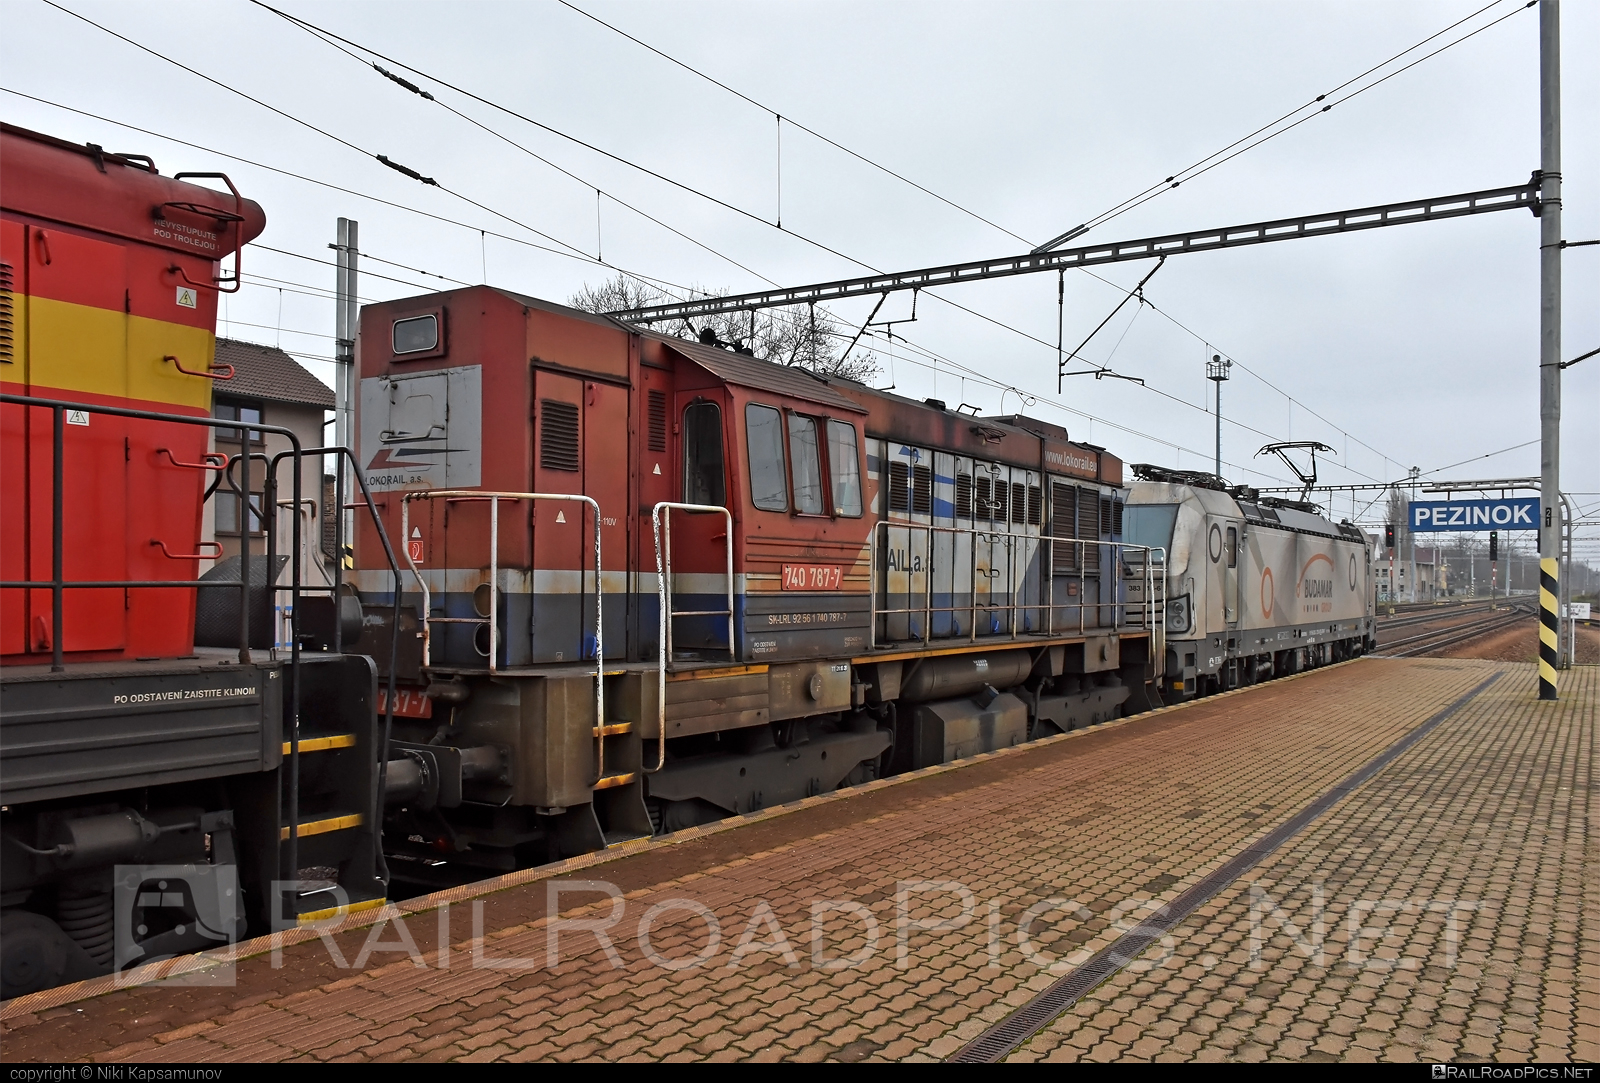 ČKD T 448.0 (740) - 740 787-7 operated by LOKORAIL, a.s. #ckd #ckd4480 #ckd740 #ckdt4480 #lokorail #lrl